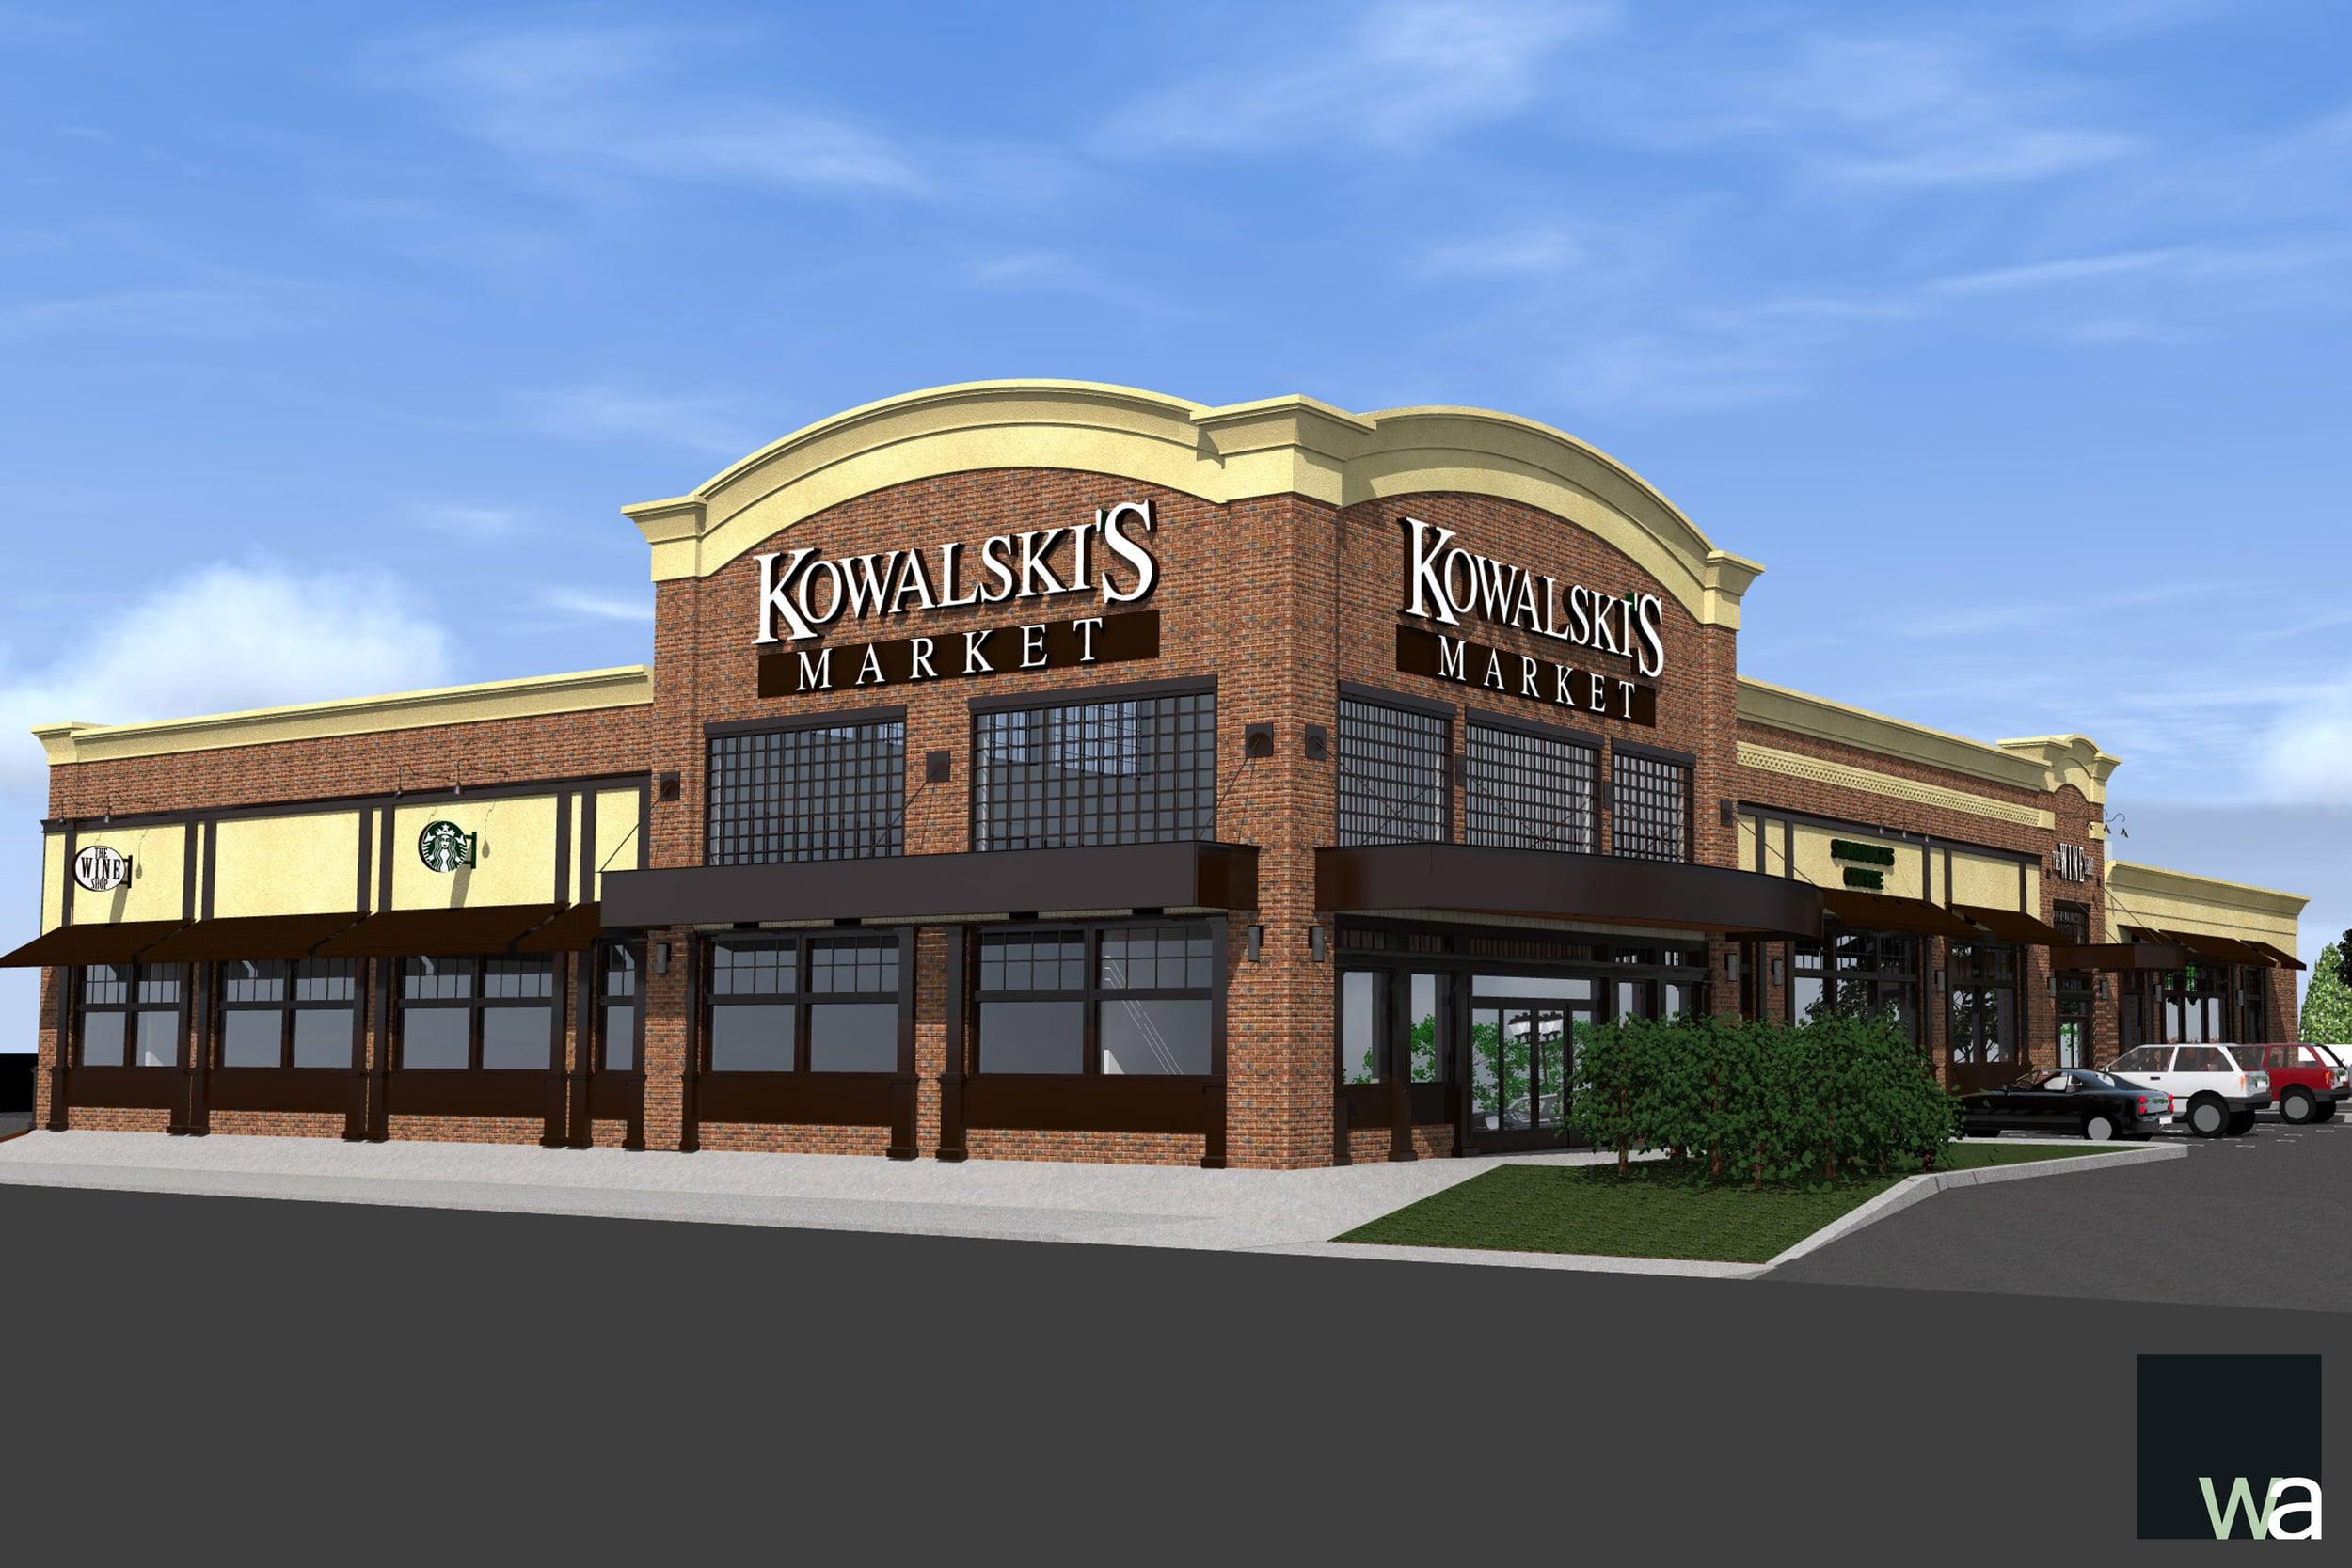 Kowalskis-Markets-Excelsior-MN.jpg